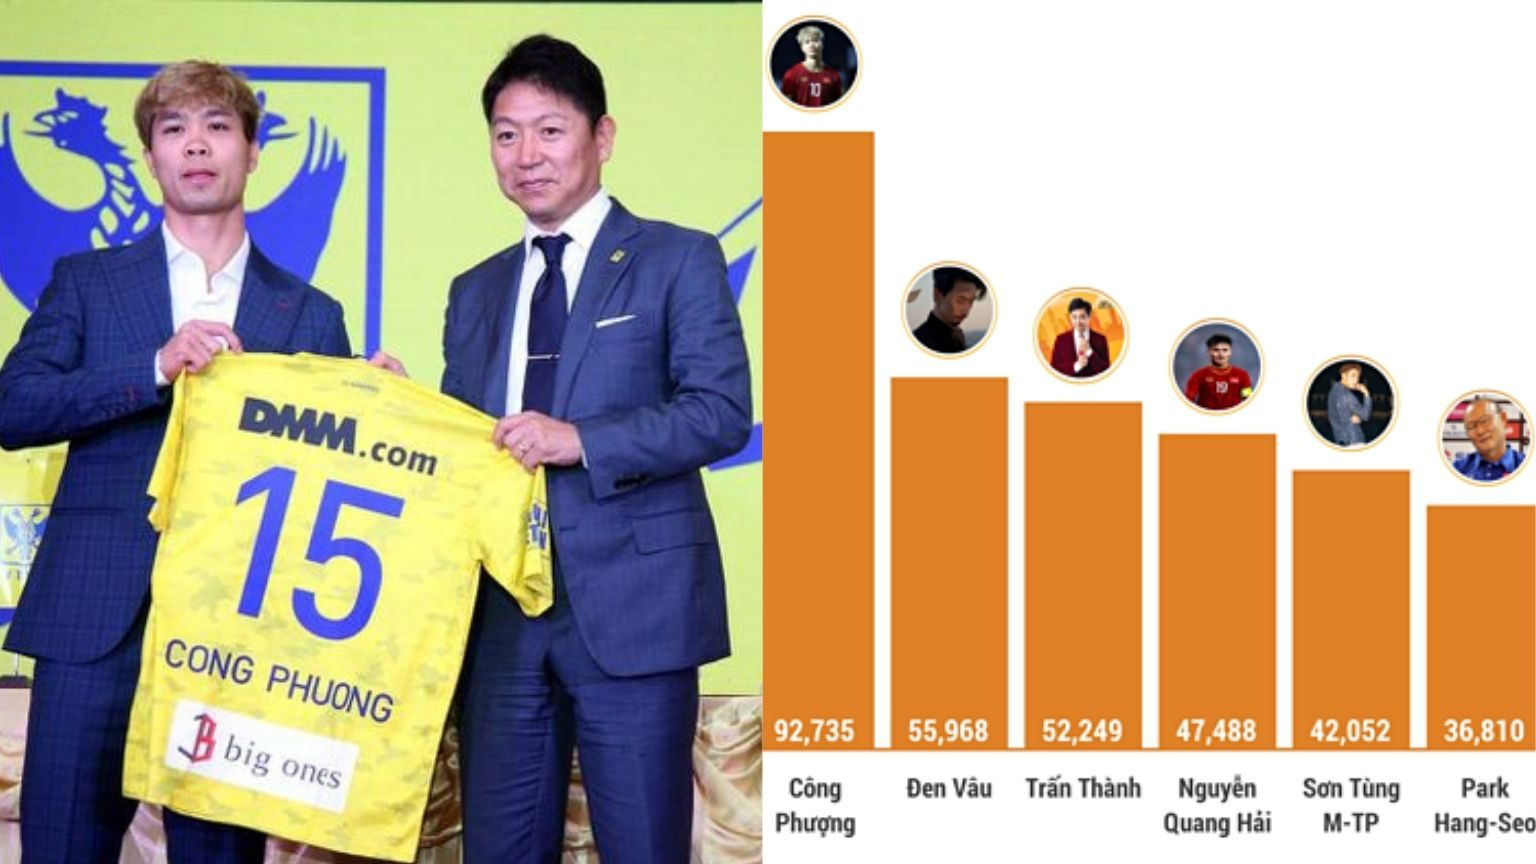 Footballer Nguyen Cong Phuong named biggest social media influencer in Vietnam